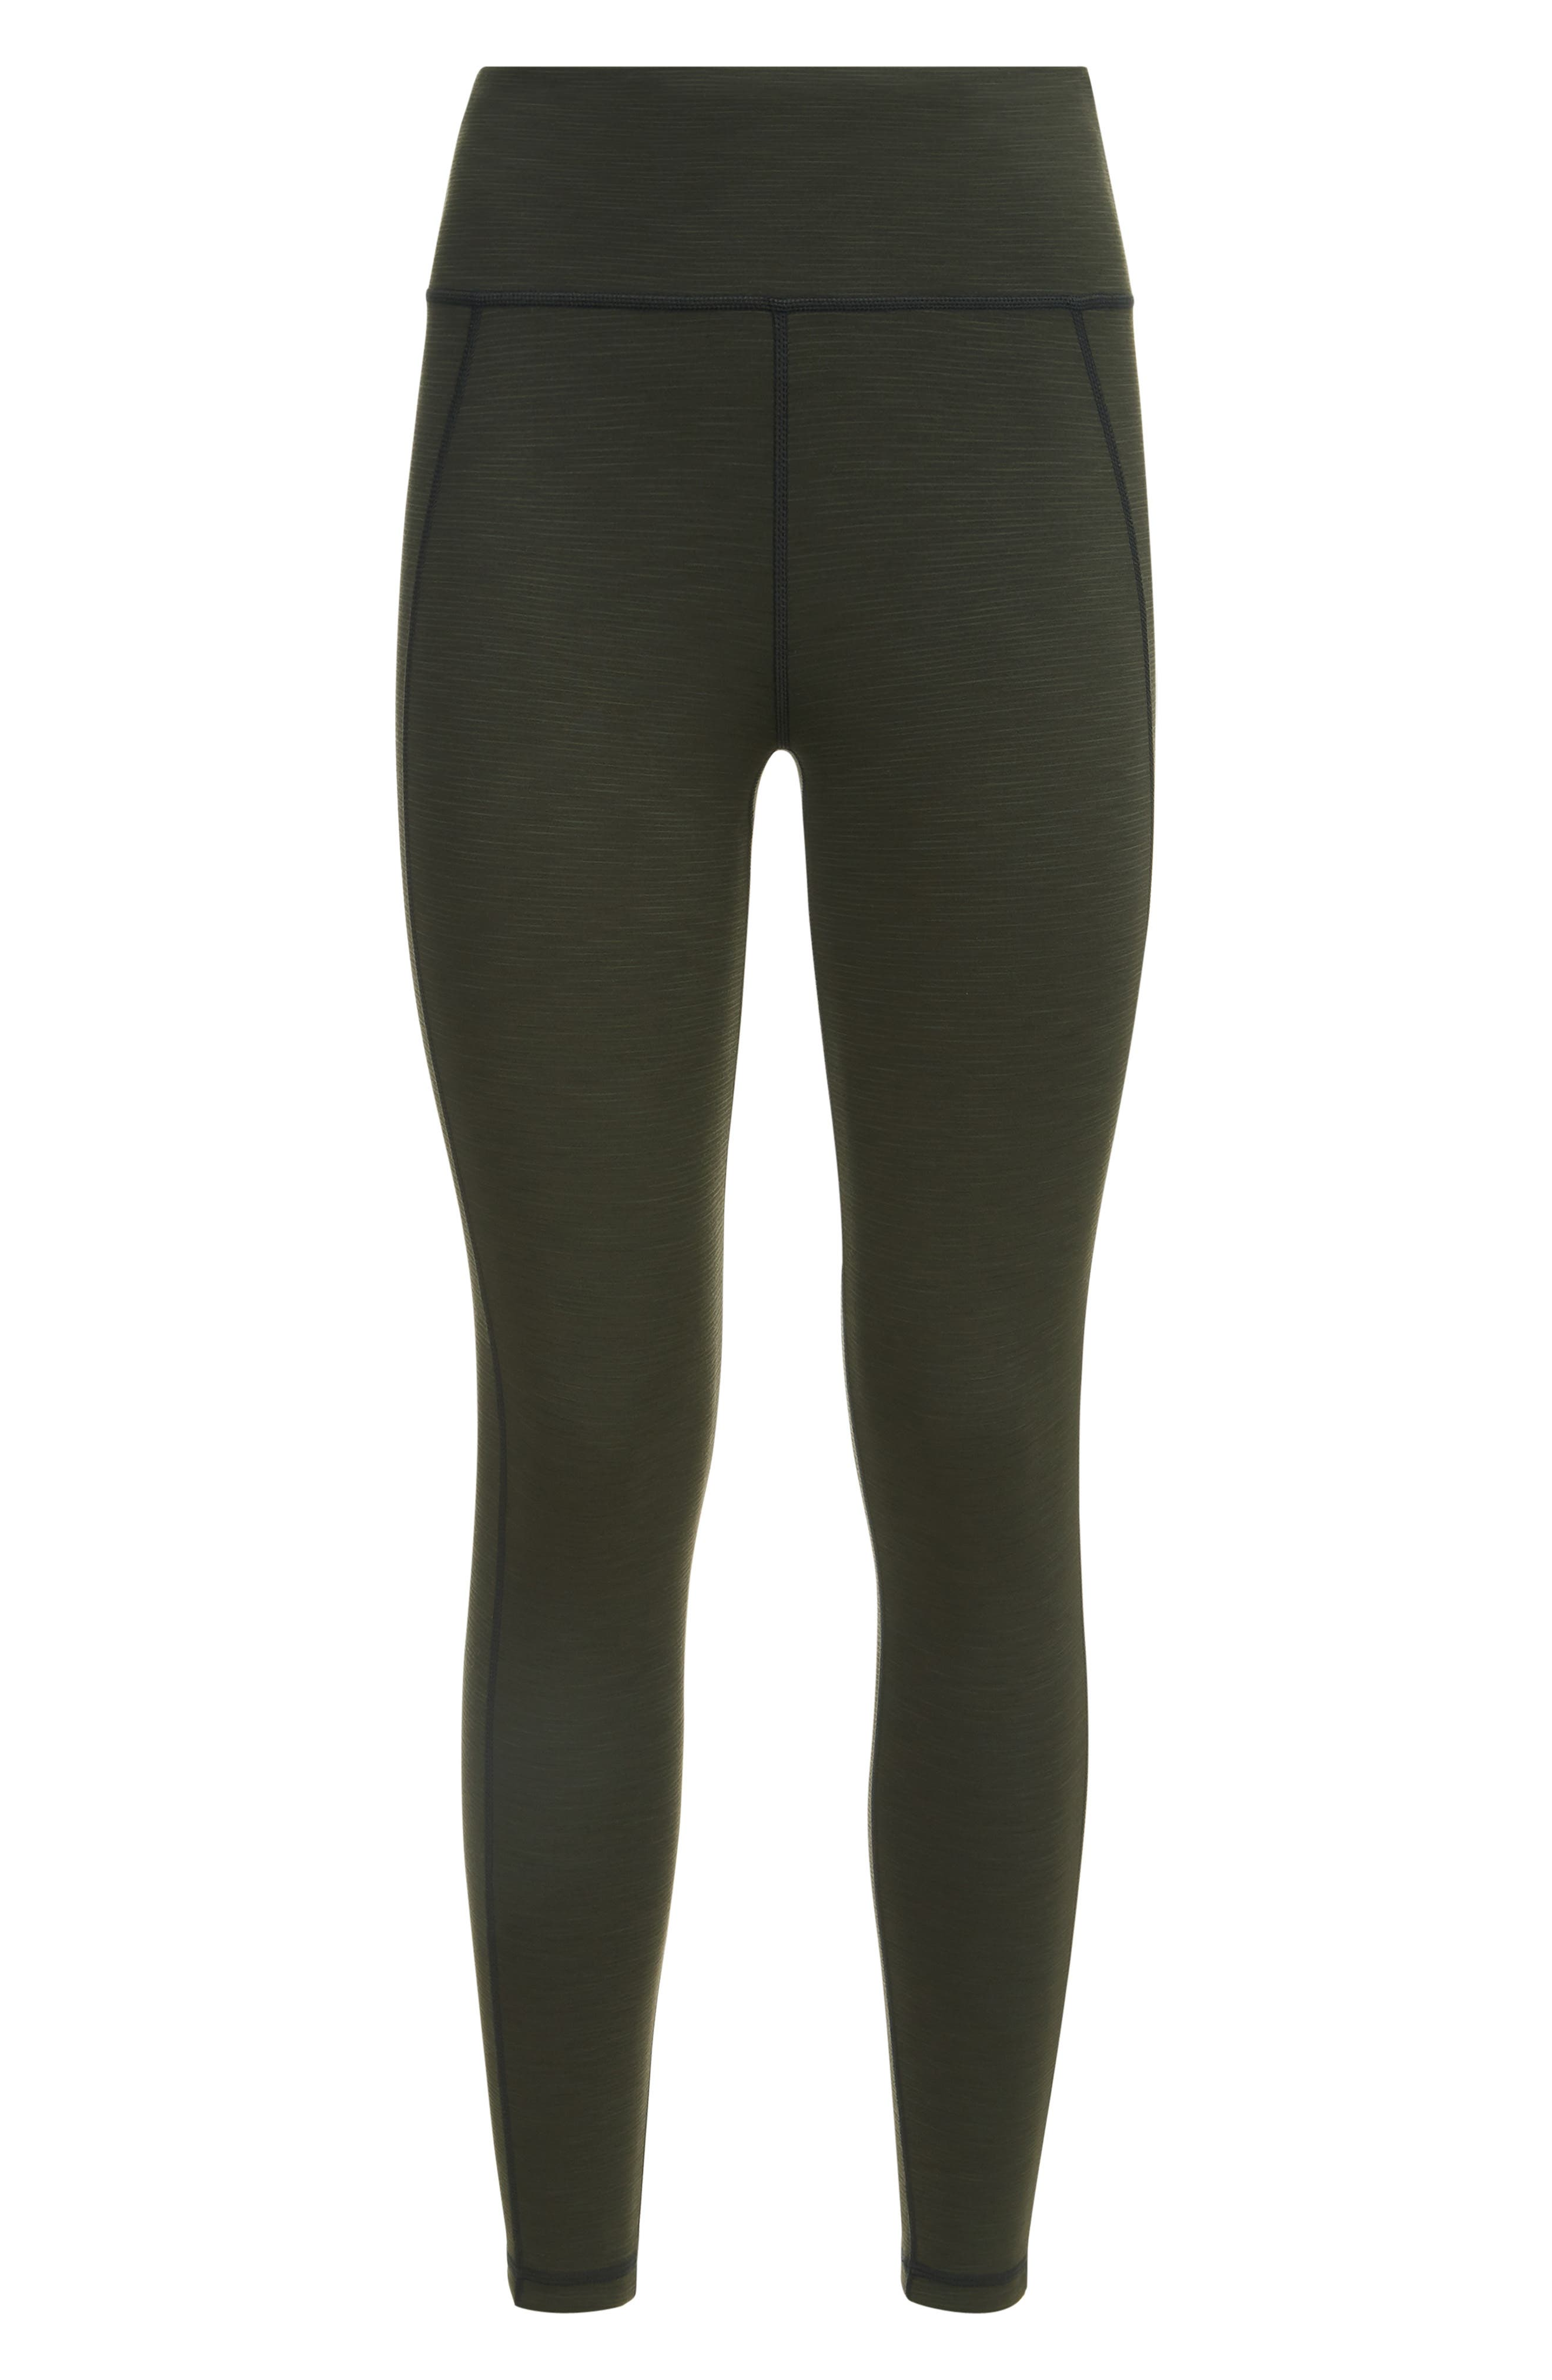 SWEATY BETTY, Reversible Yoga Leggings, Alternate thumbnail 5, color, 300